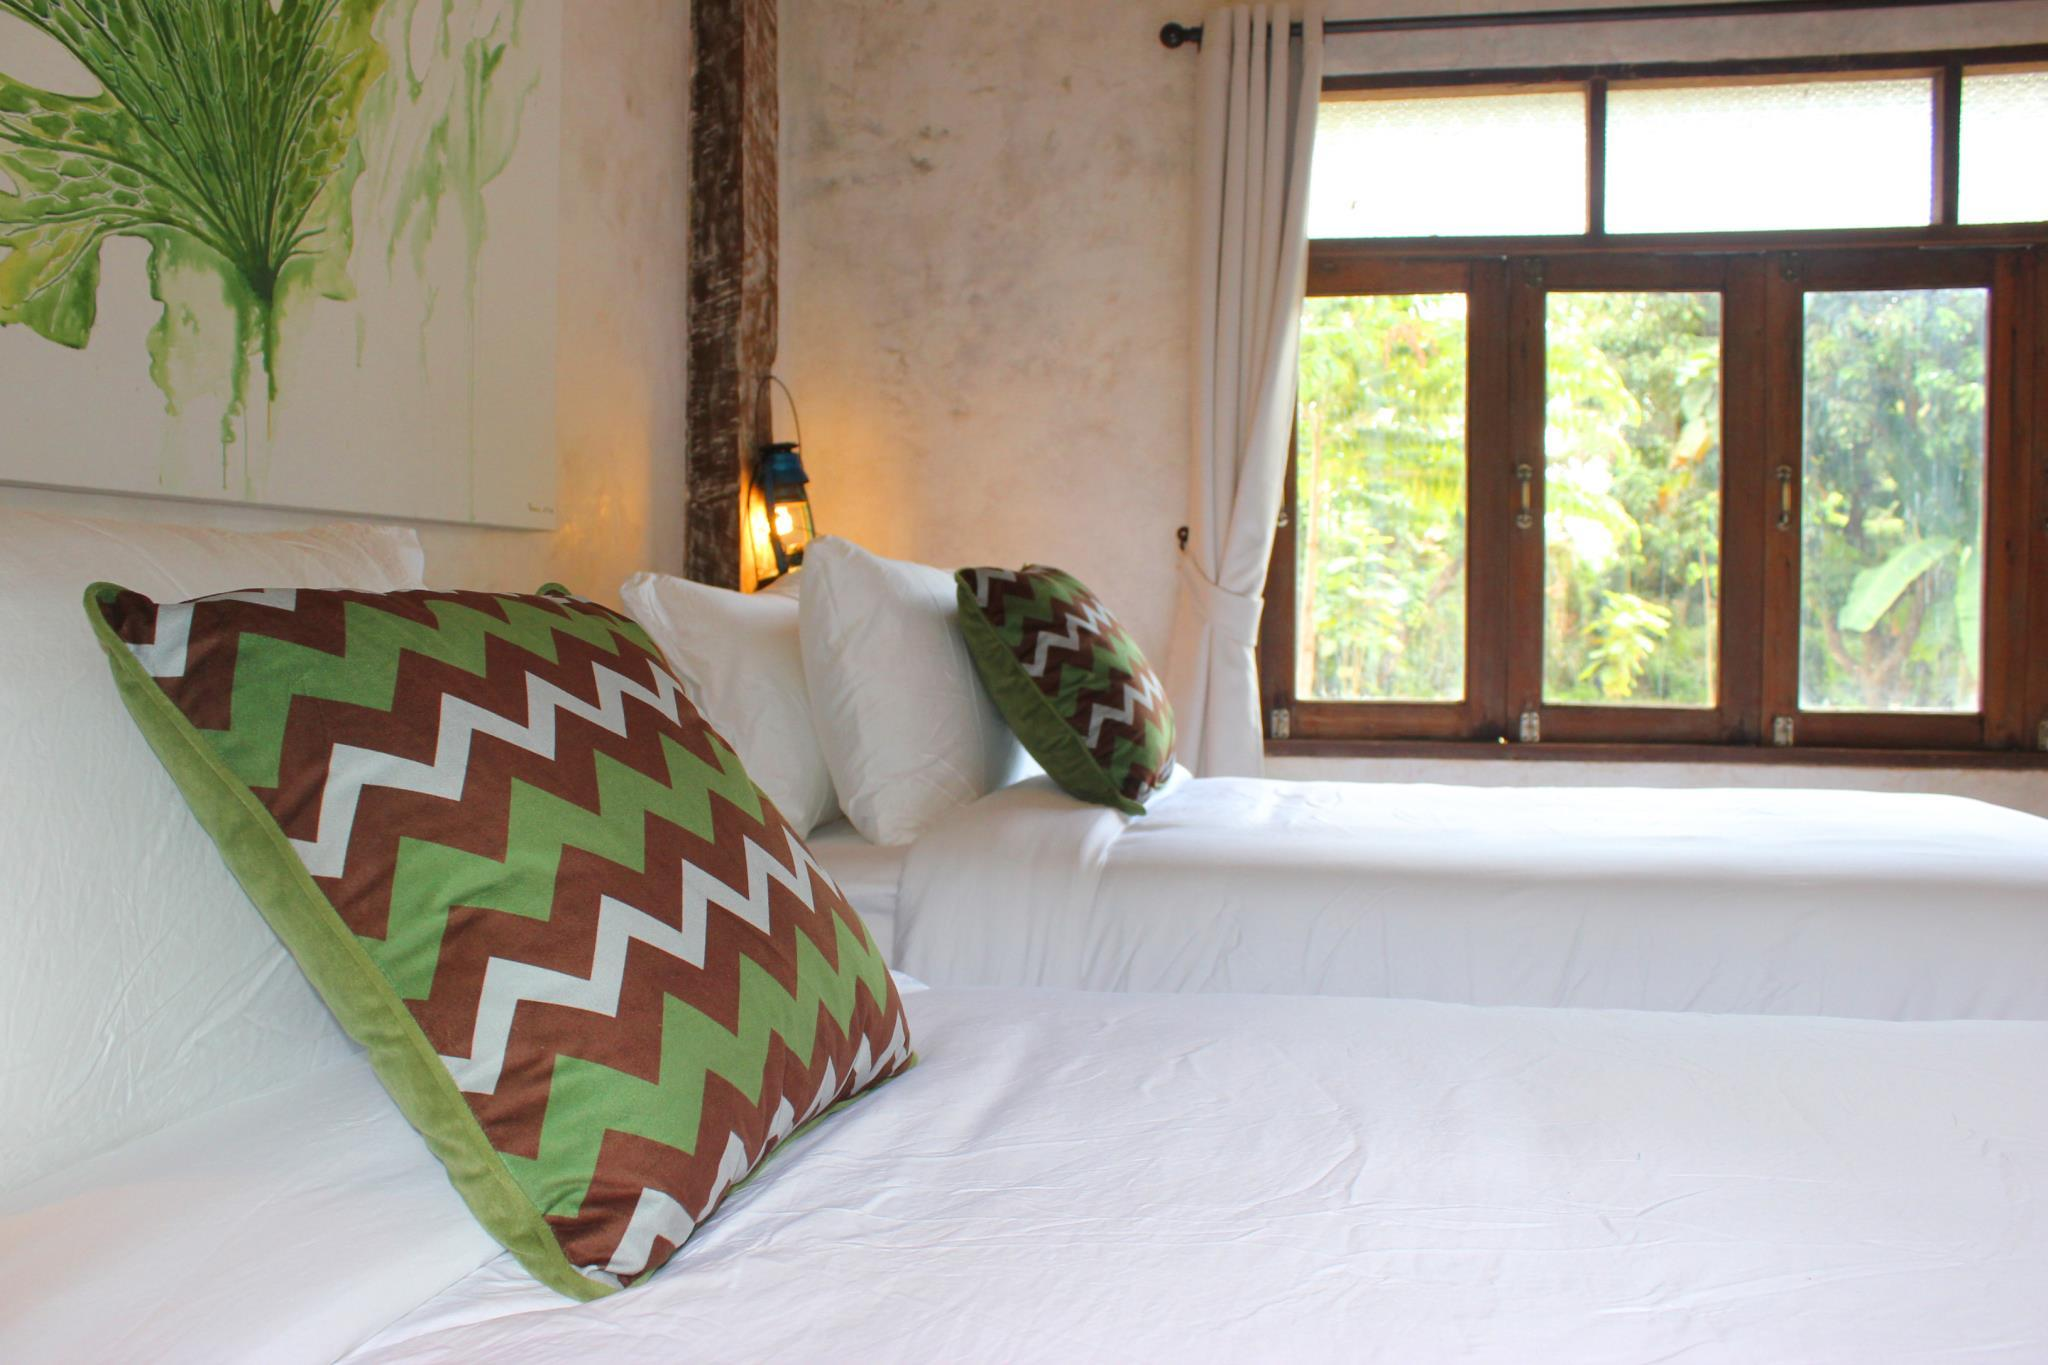 Baanchandra Deluxe Twin Room with Garden View,สตูดิโอ บ้าน 0 ห้องน้ำส่วนตัว ขนาด 20 ตร.ม. – หางดง